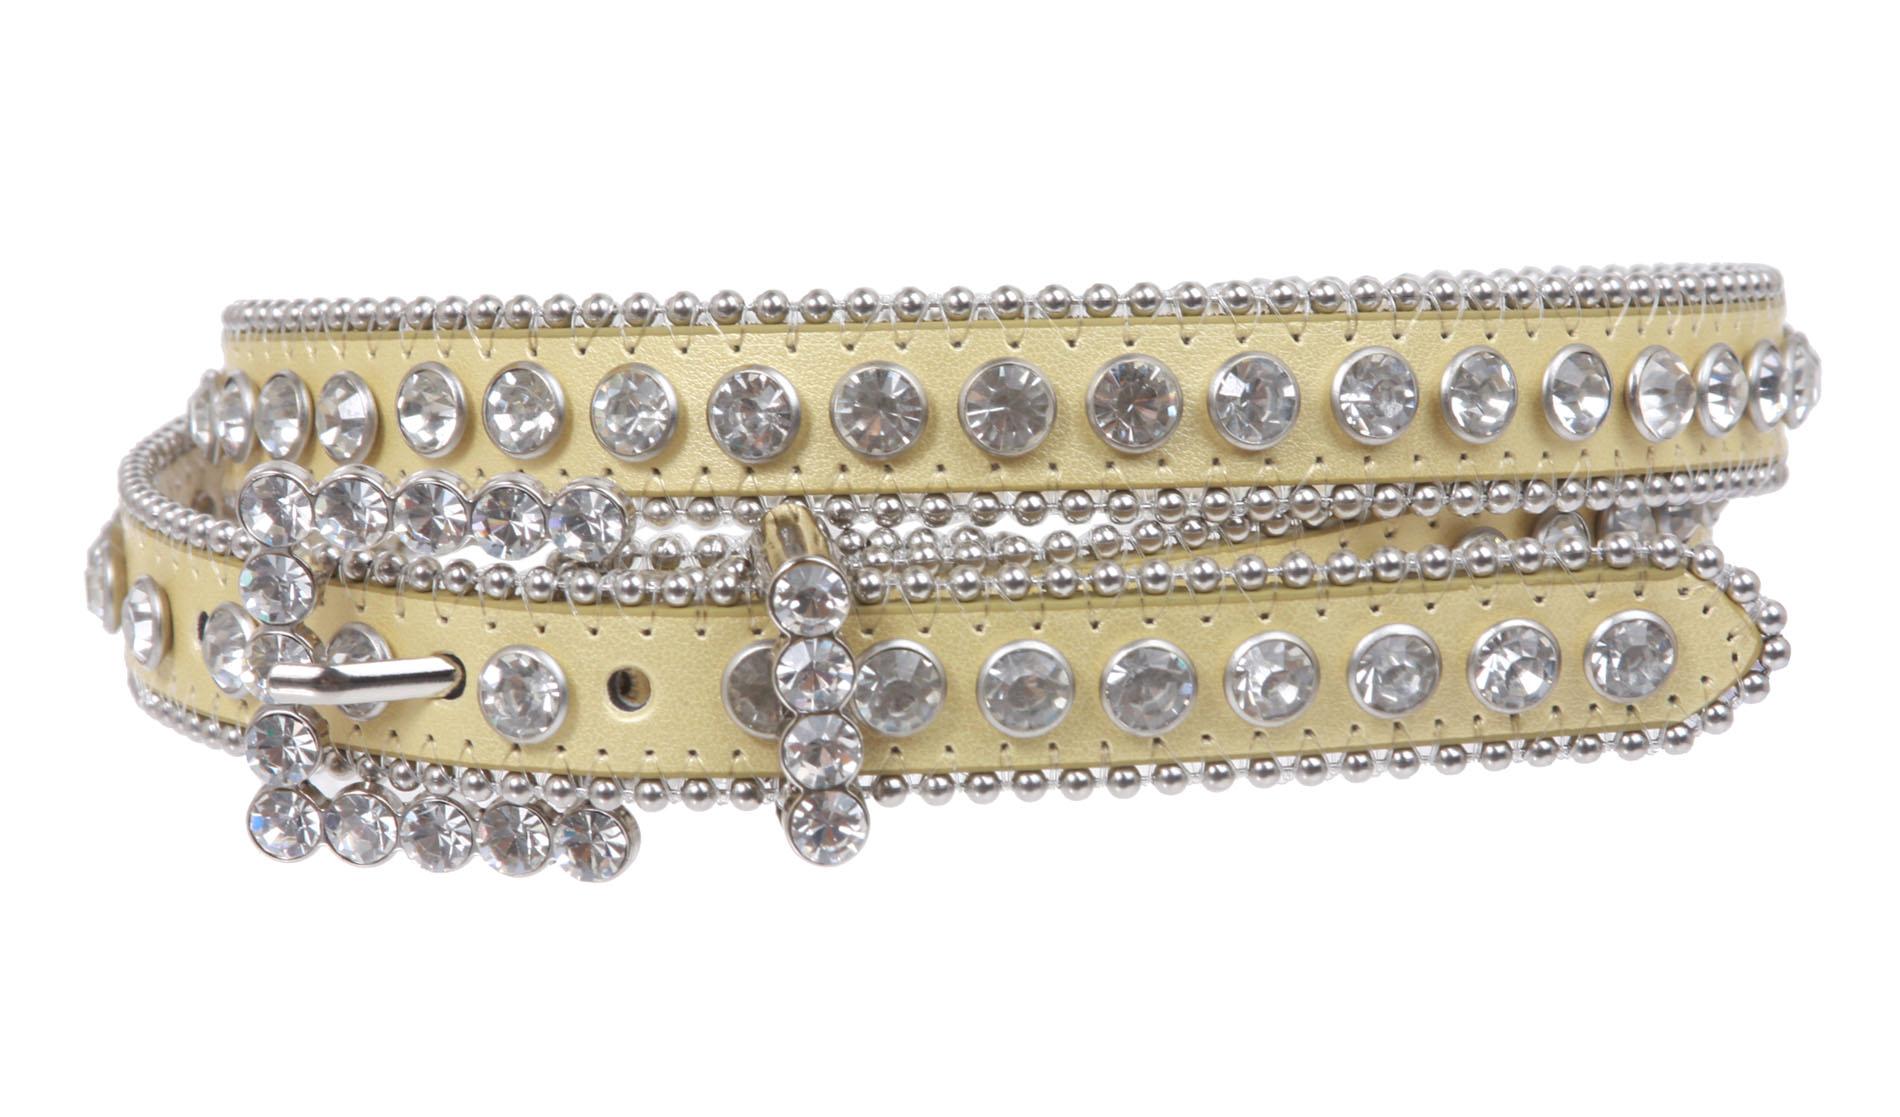 3 4 quot 19 mm rhinestone leather belt ebay